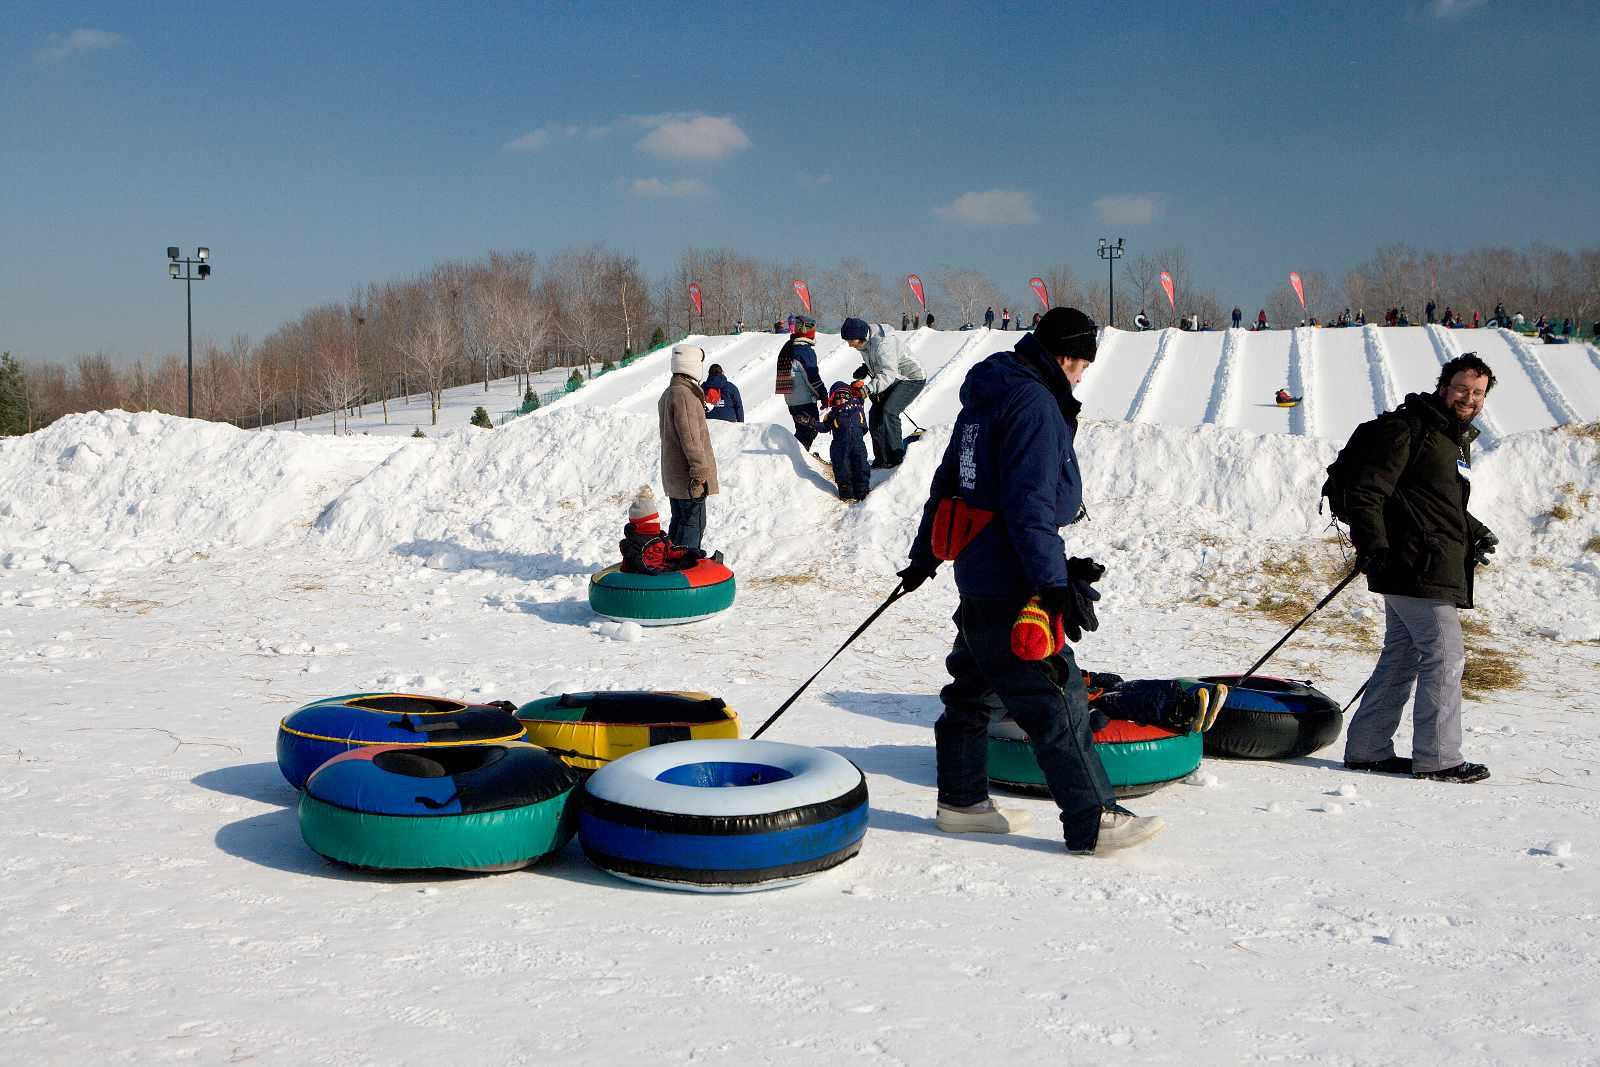 Parc Jean-Drapeau winter attractions include snow tubing